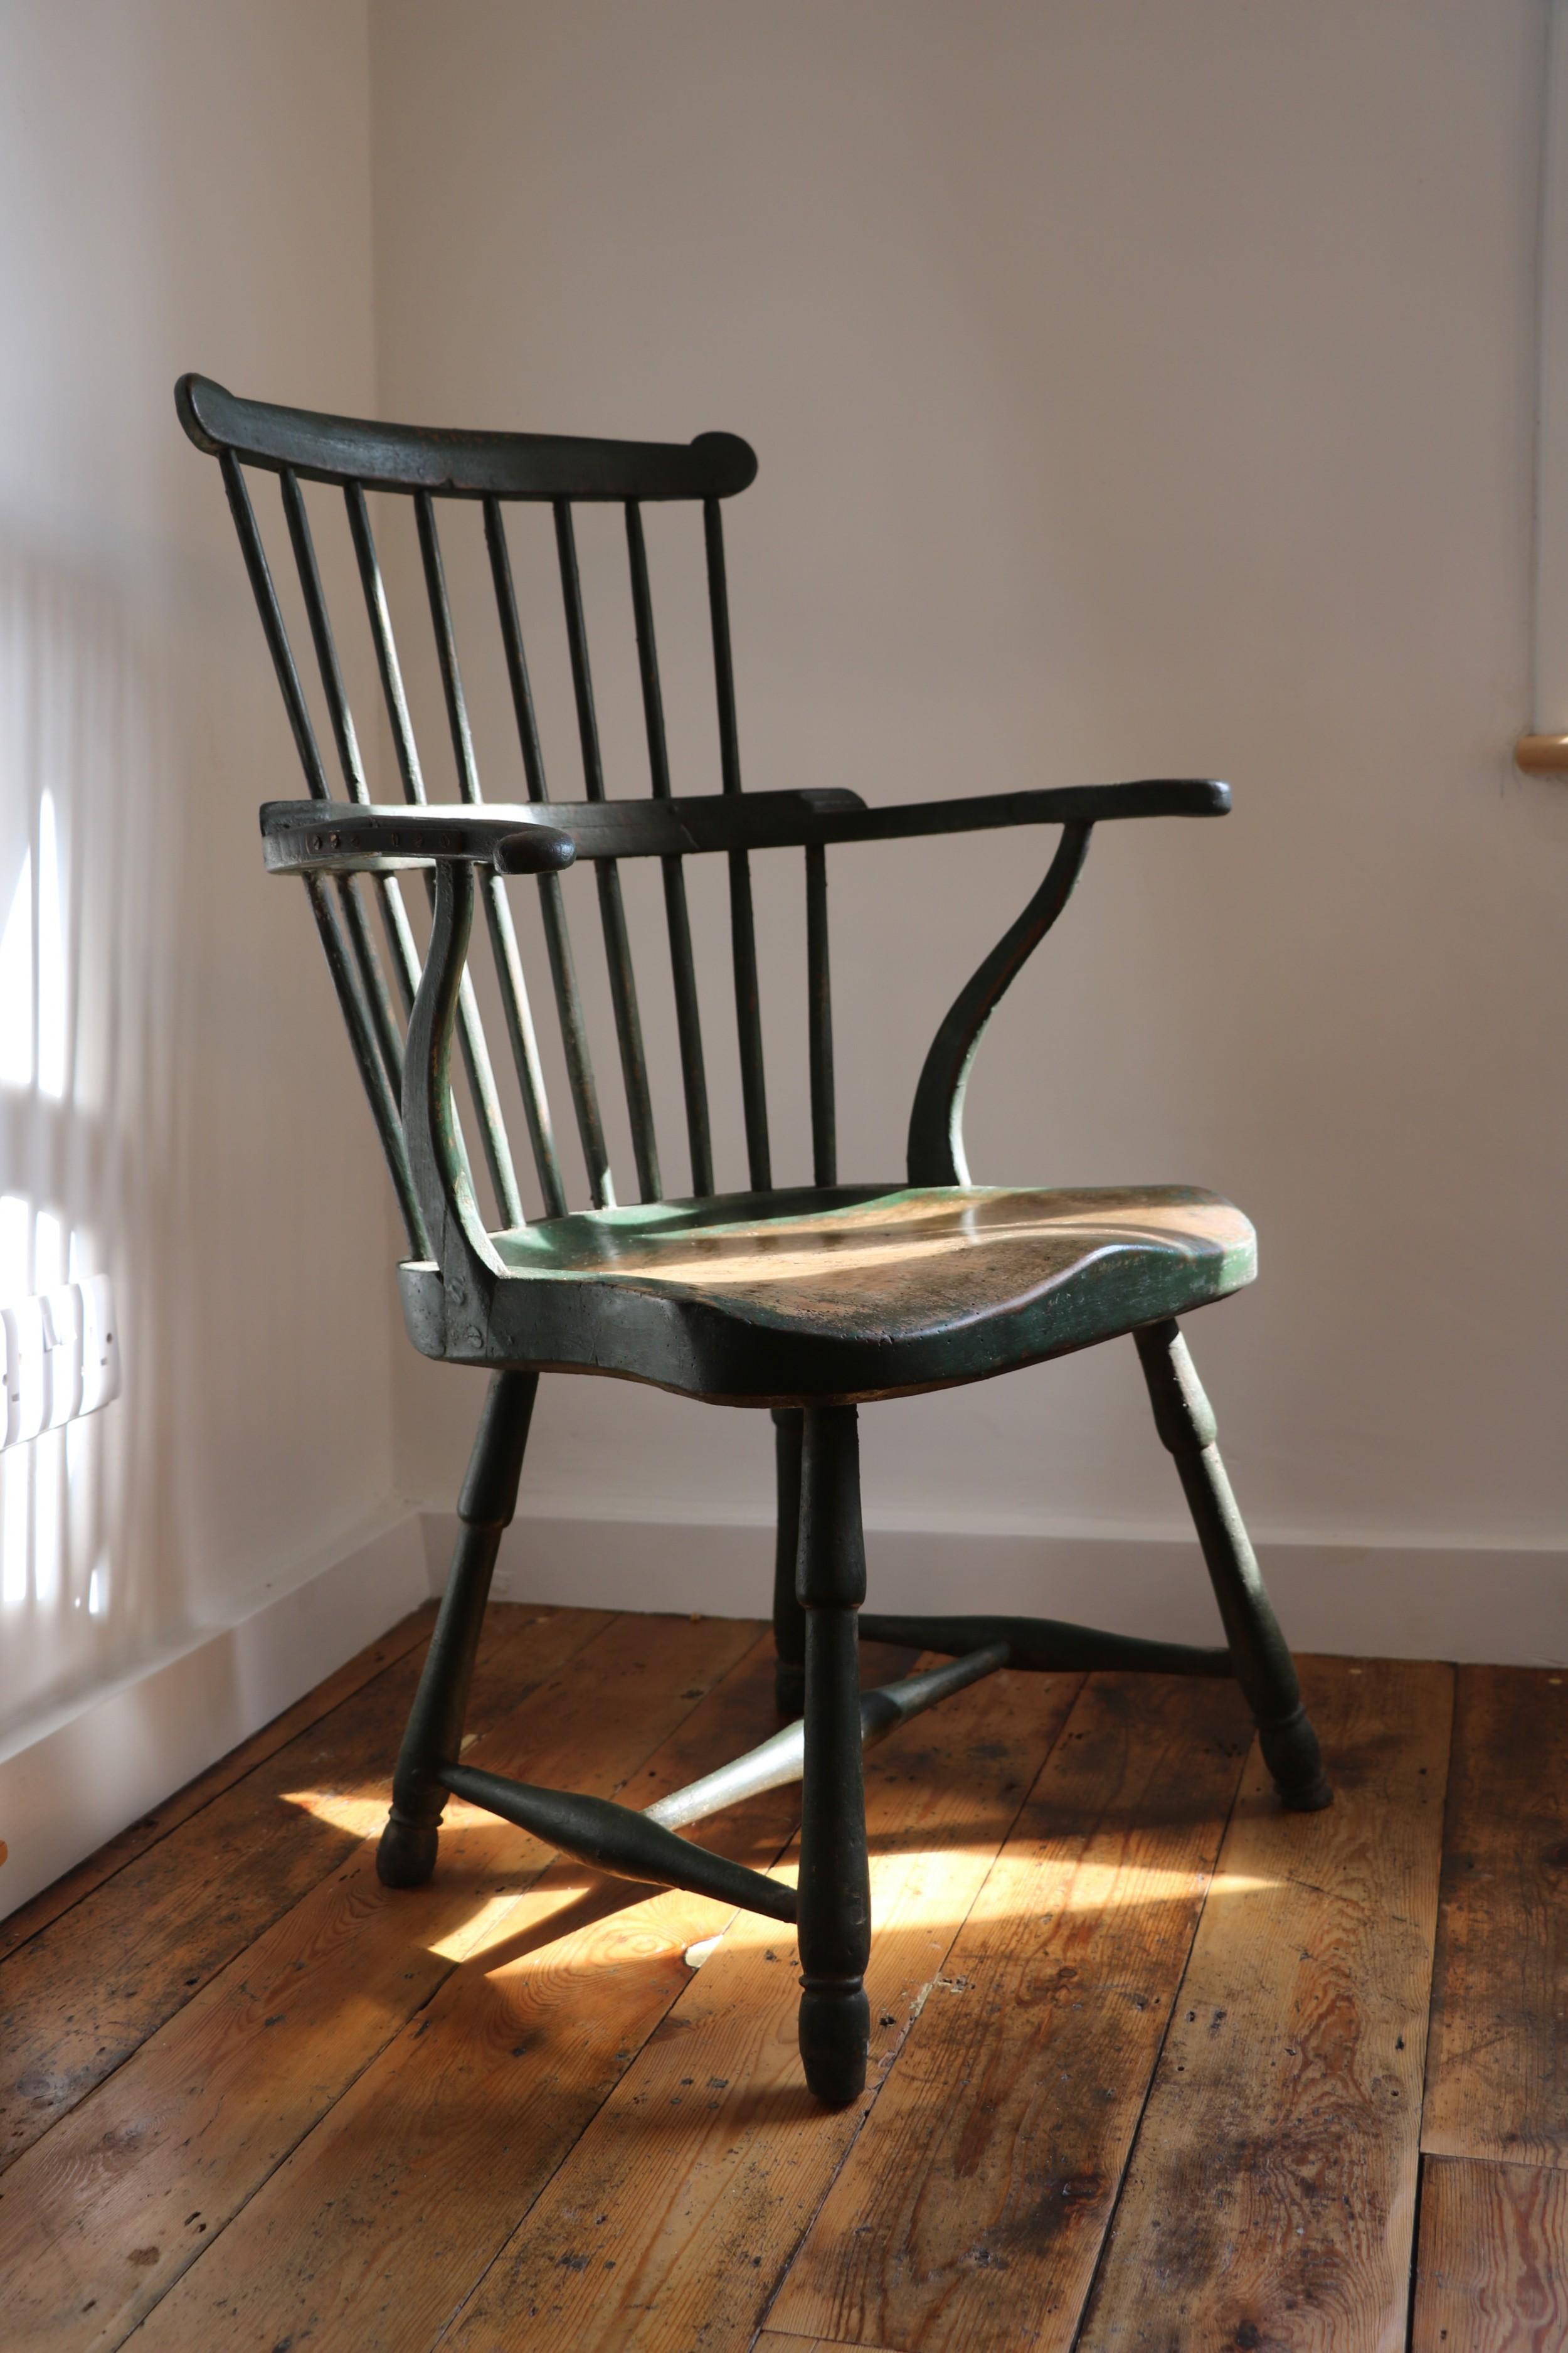 18th century west country primitve windsor comb back antique stick chair